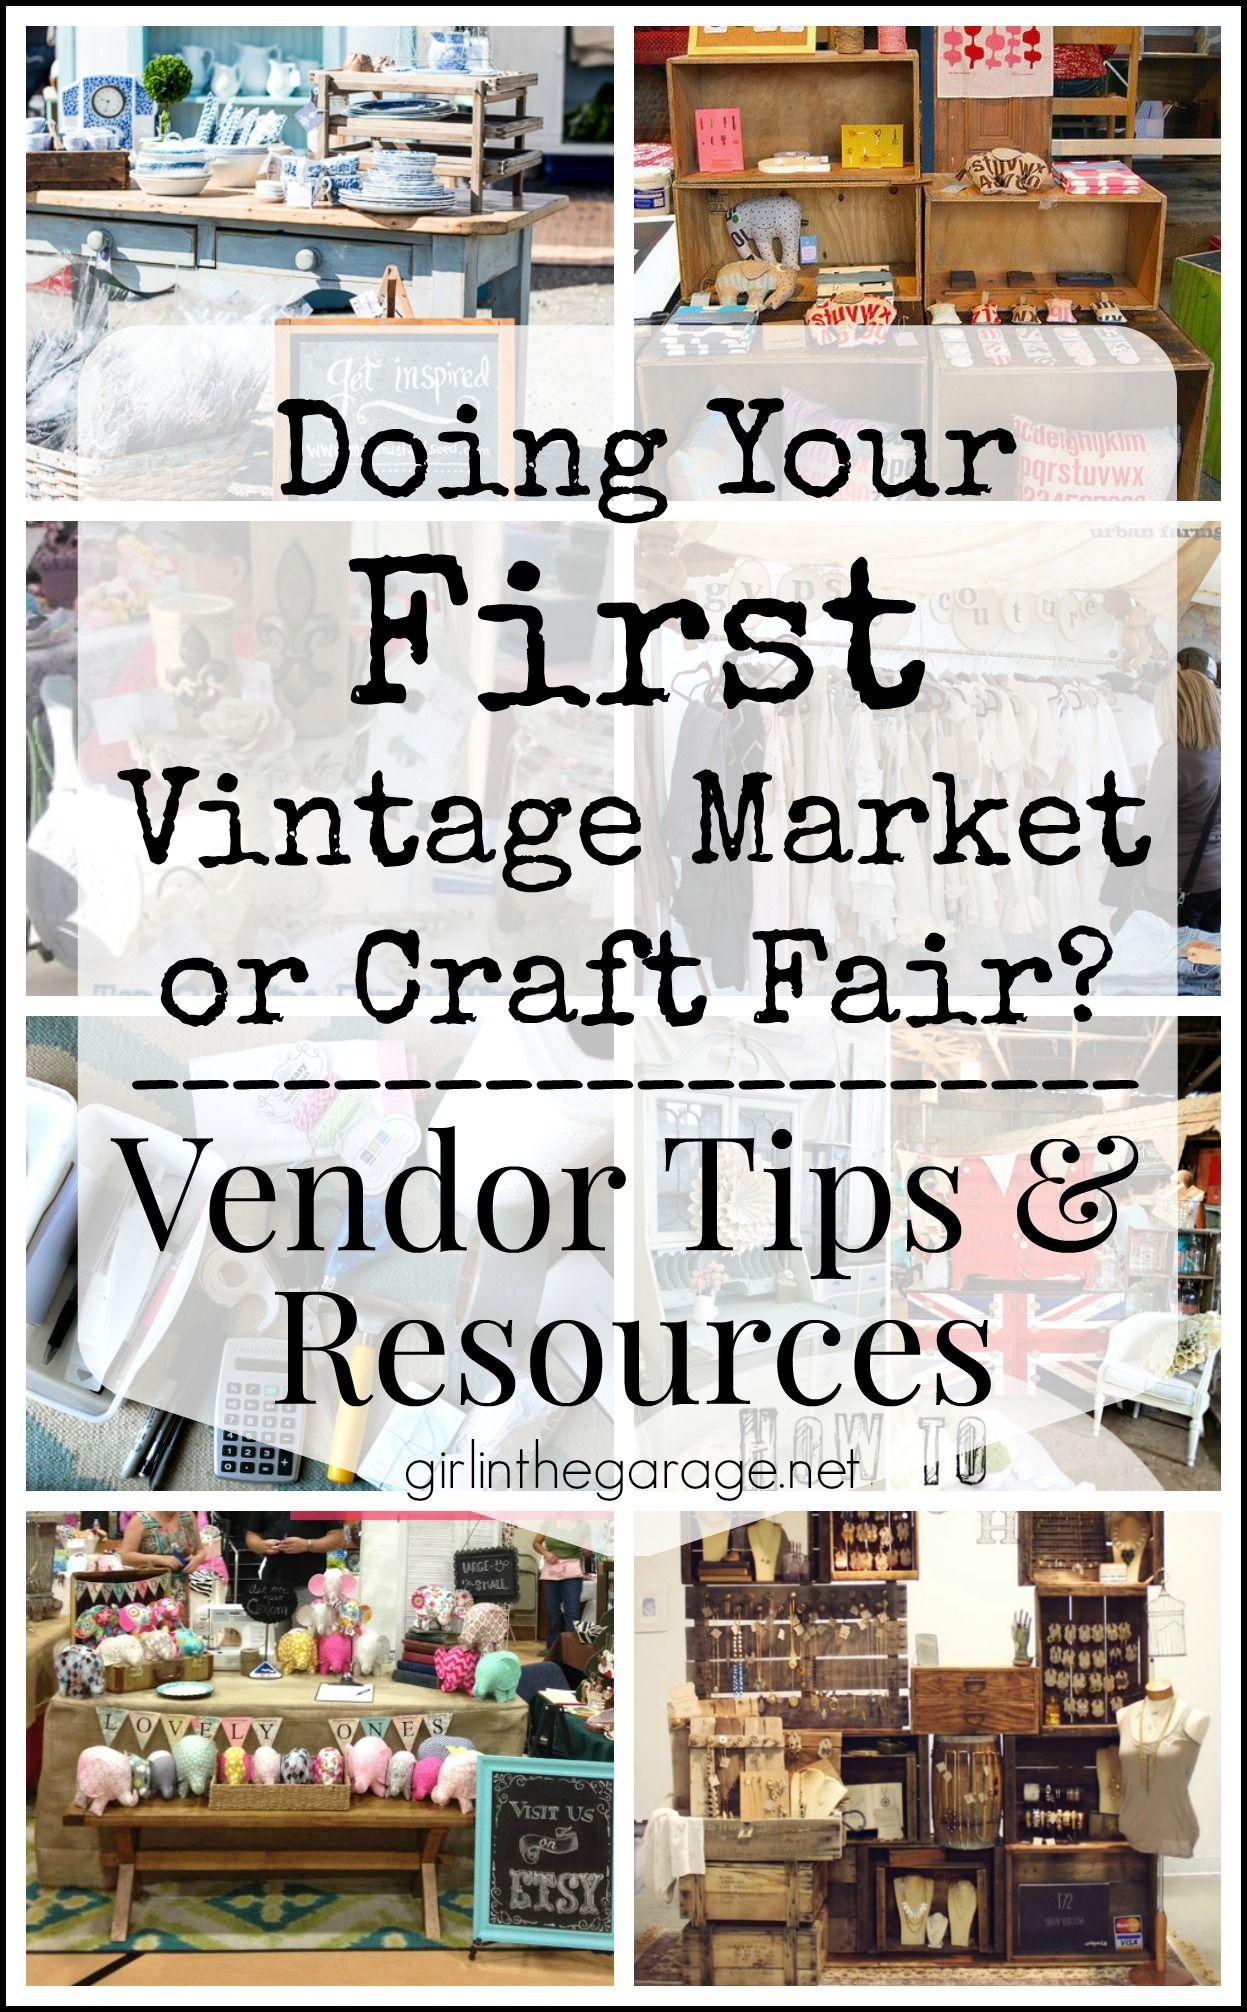 Doing your first vintage market or craft fair vendor